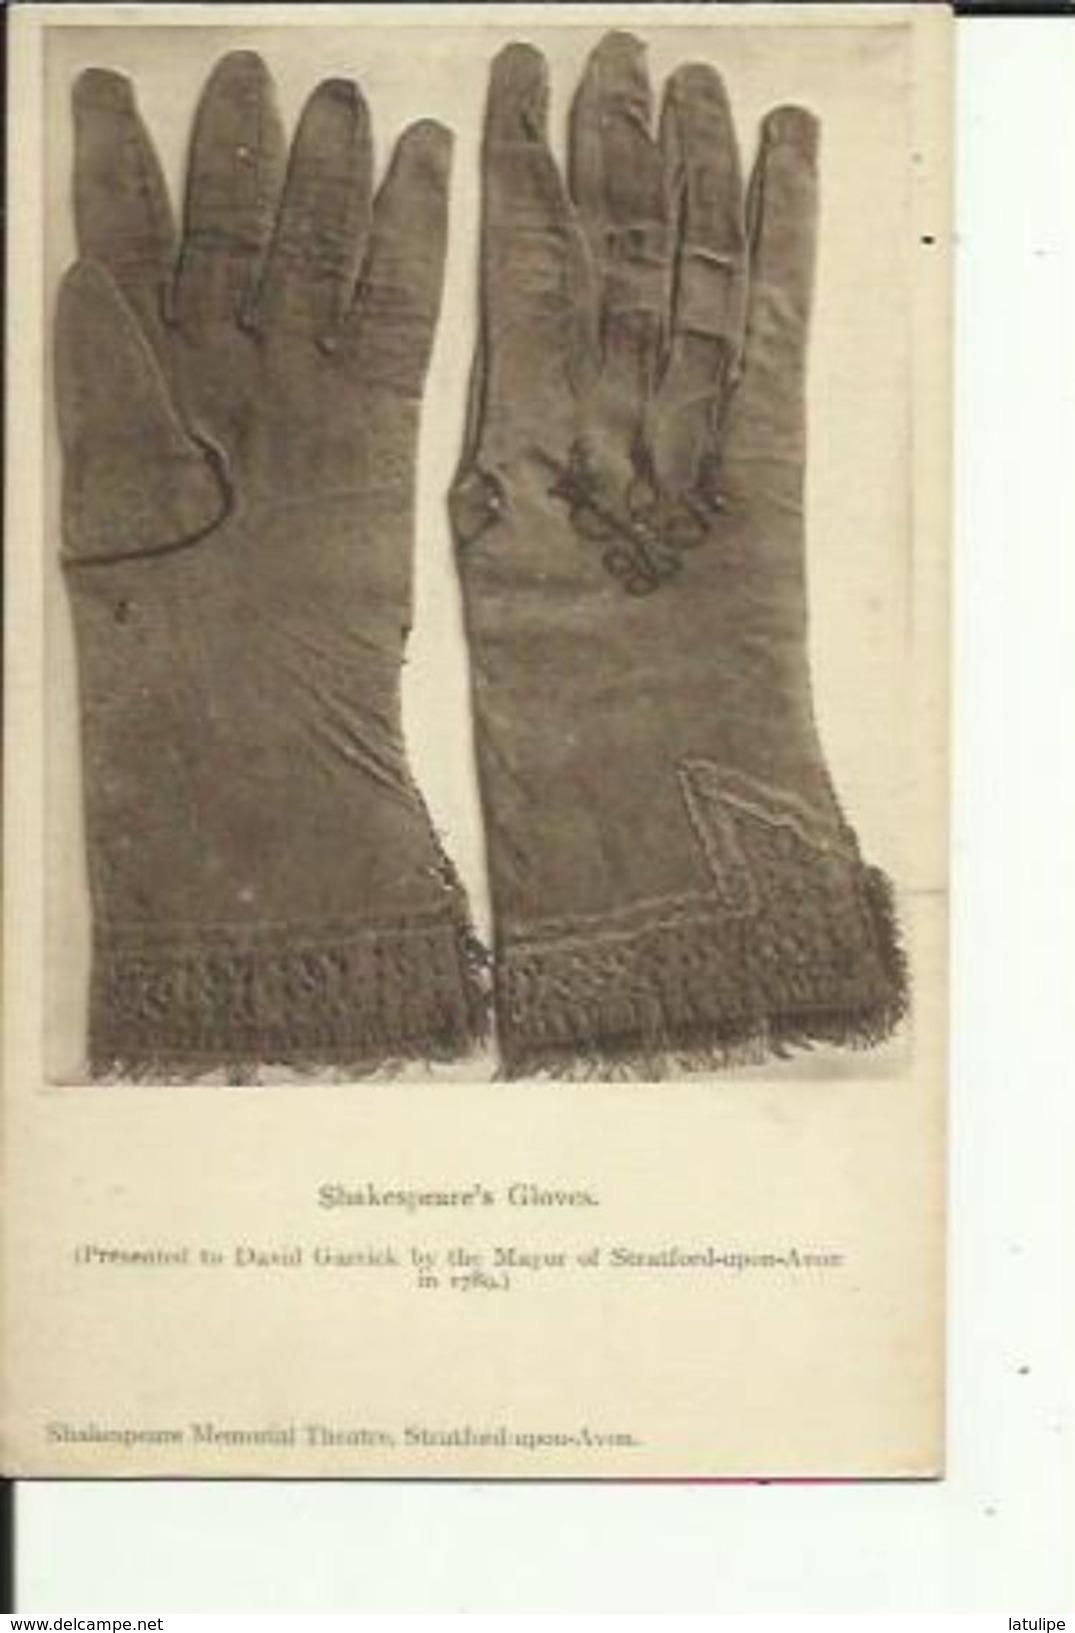 SHAKESPEARE'S GLOVES  Prented To David Garrick By The Mayor Of Stratford Upon Avon - United Kingdom